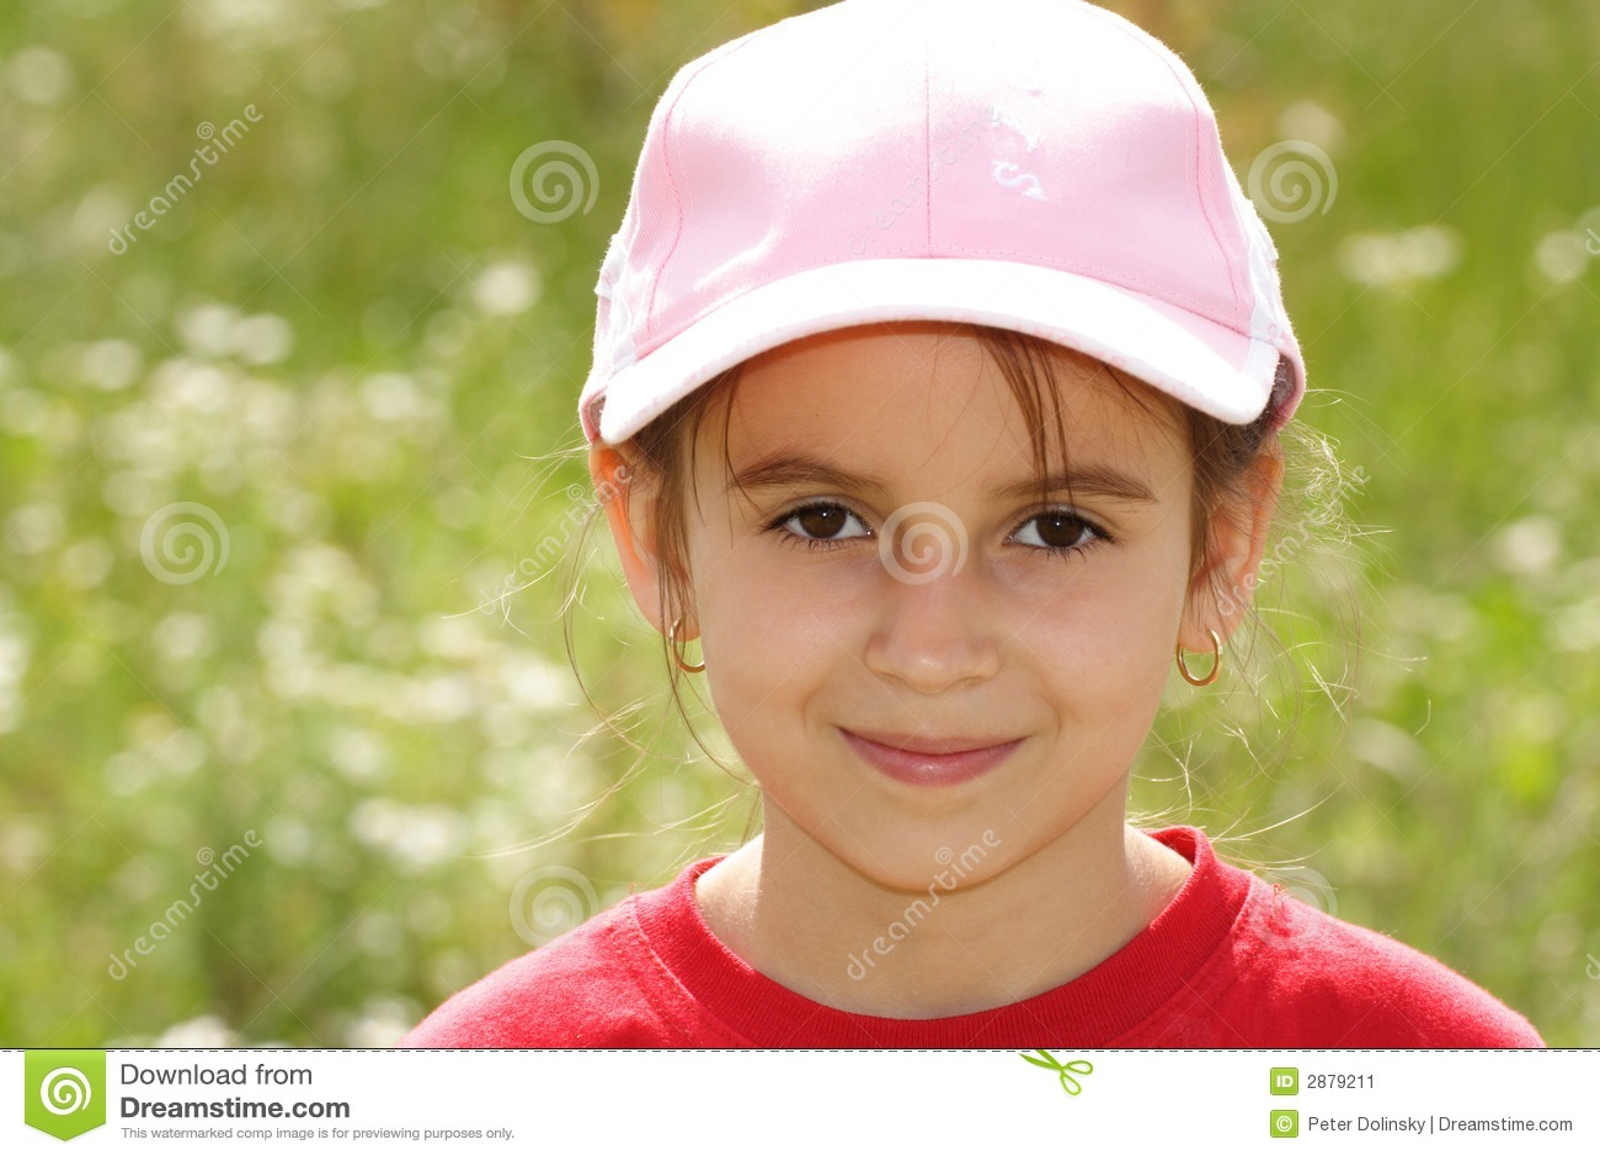 Girl in a Baseball Cap stock image. Image of children - 2879211 c7693bce612